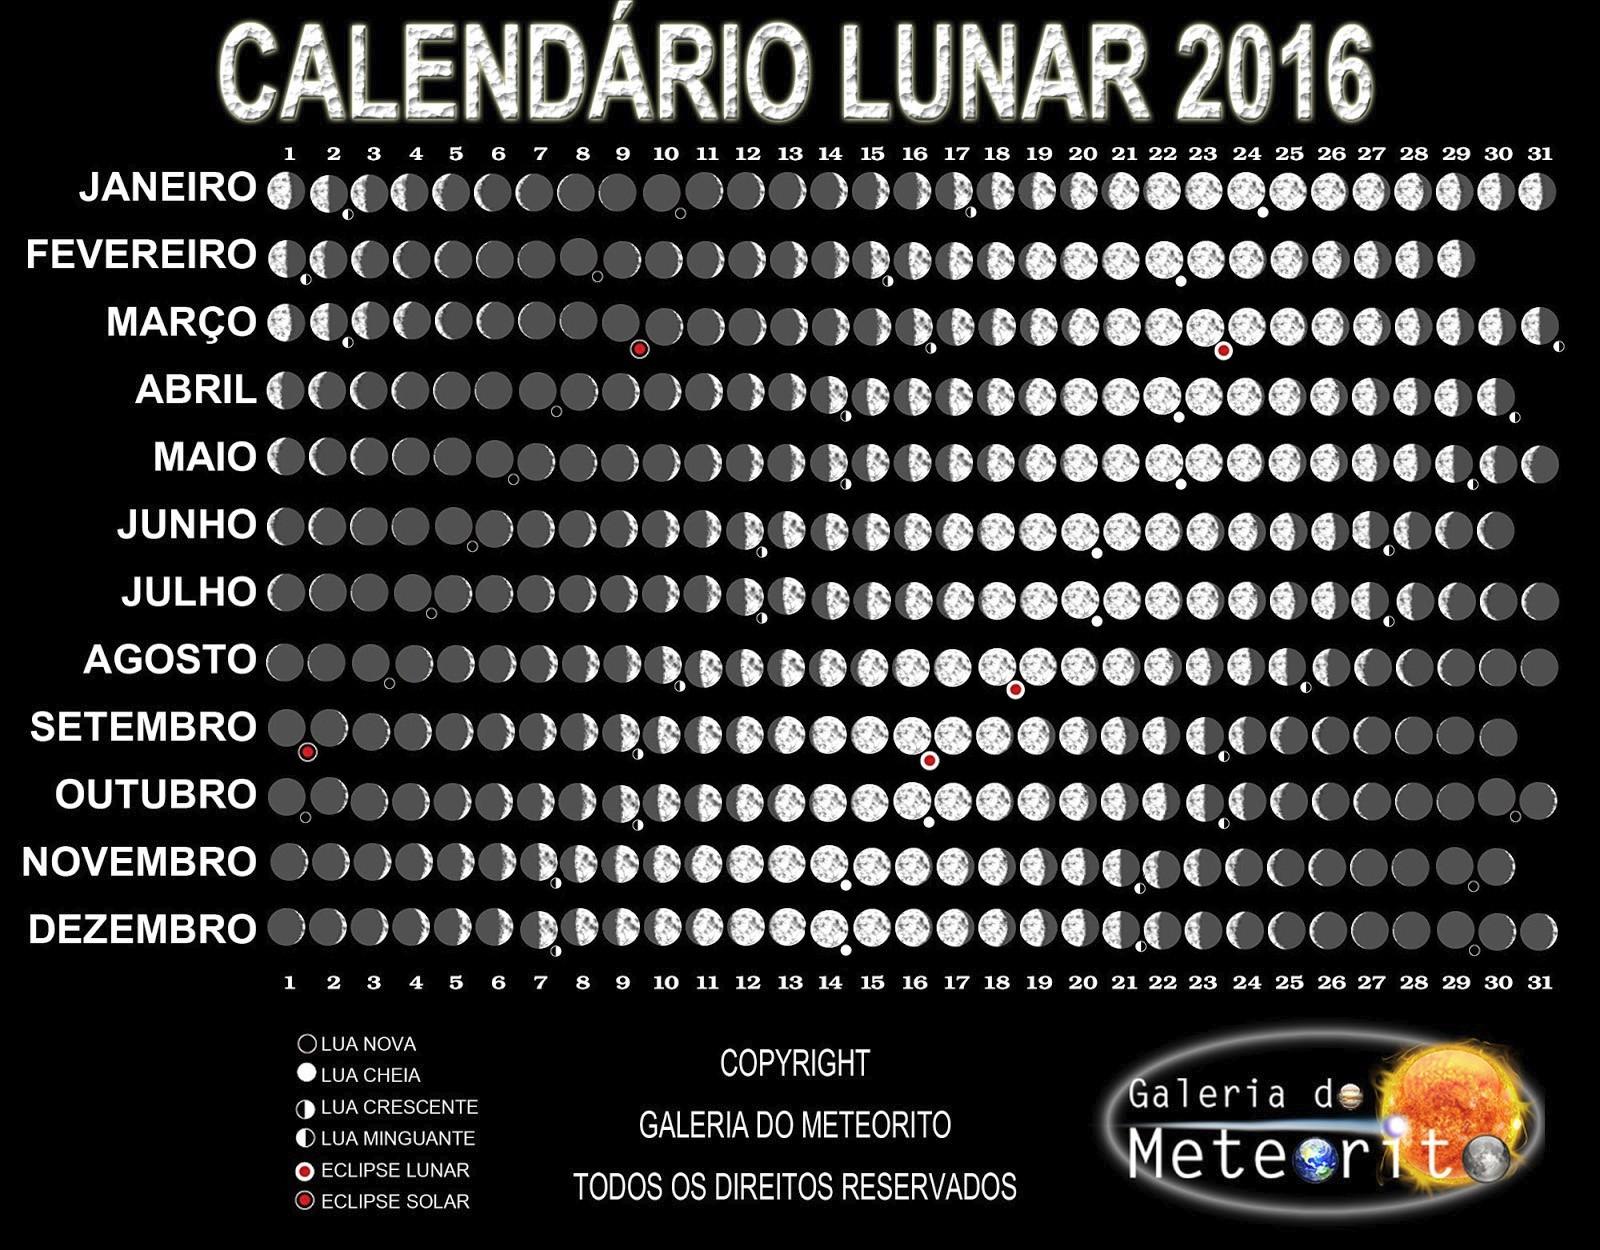 Calend rio lunar galeria do meteorito for Calendario lunar 2016 colombia